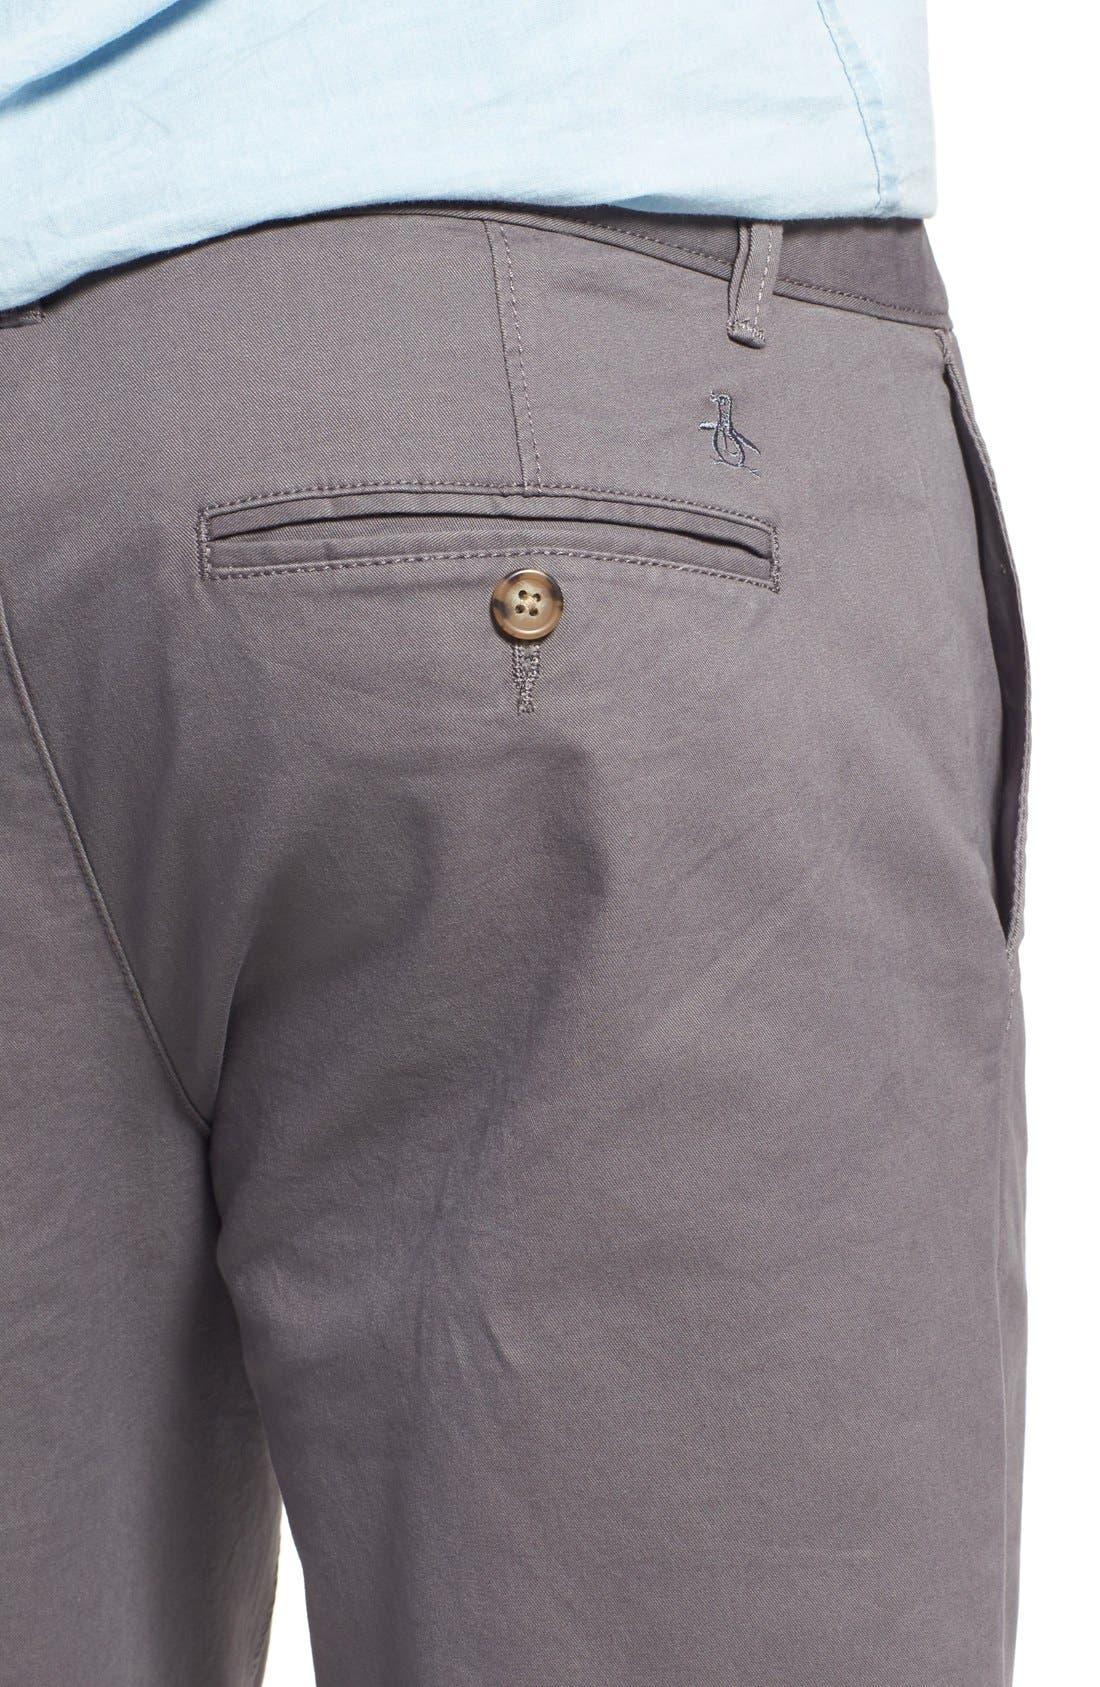 'P55' Slim Fit Stretch Cotton Chinos,                             Alternate thumbnail 4, color,                             CASTLEROCK